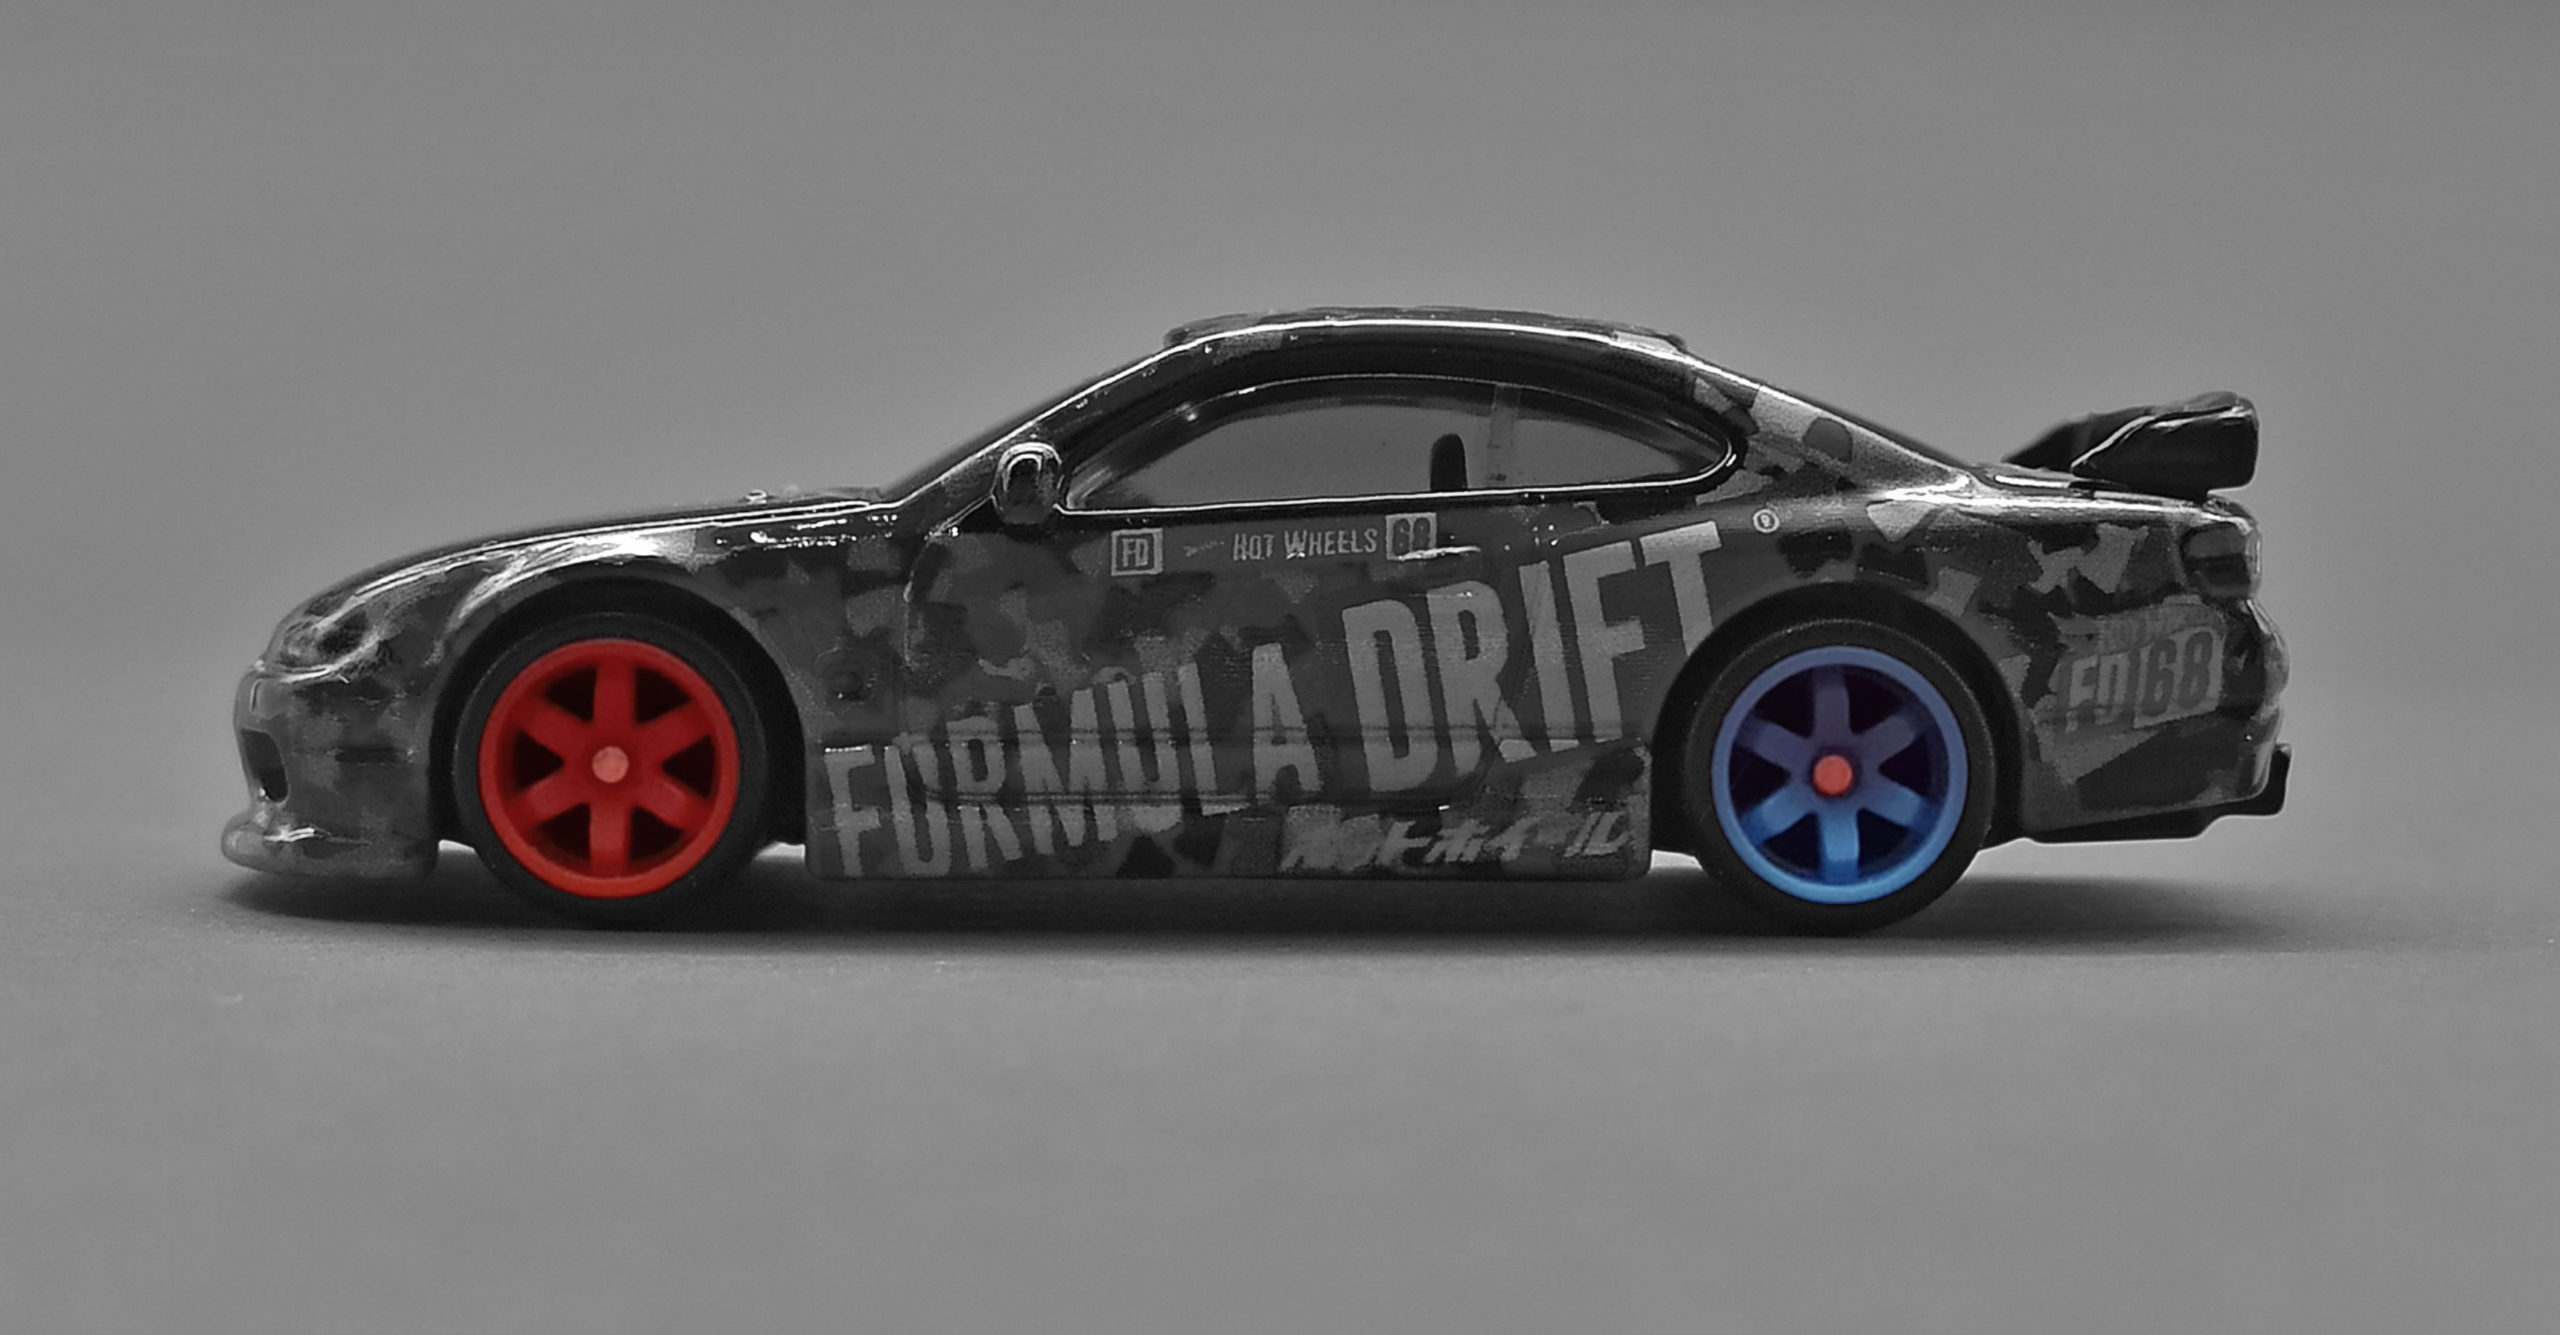 Hot Wheels Nissan Silvia S15 2018 model (GRB46) 2020 Hot Wheels Boulevard #7 Formula Drift red & blue black side